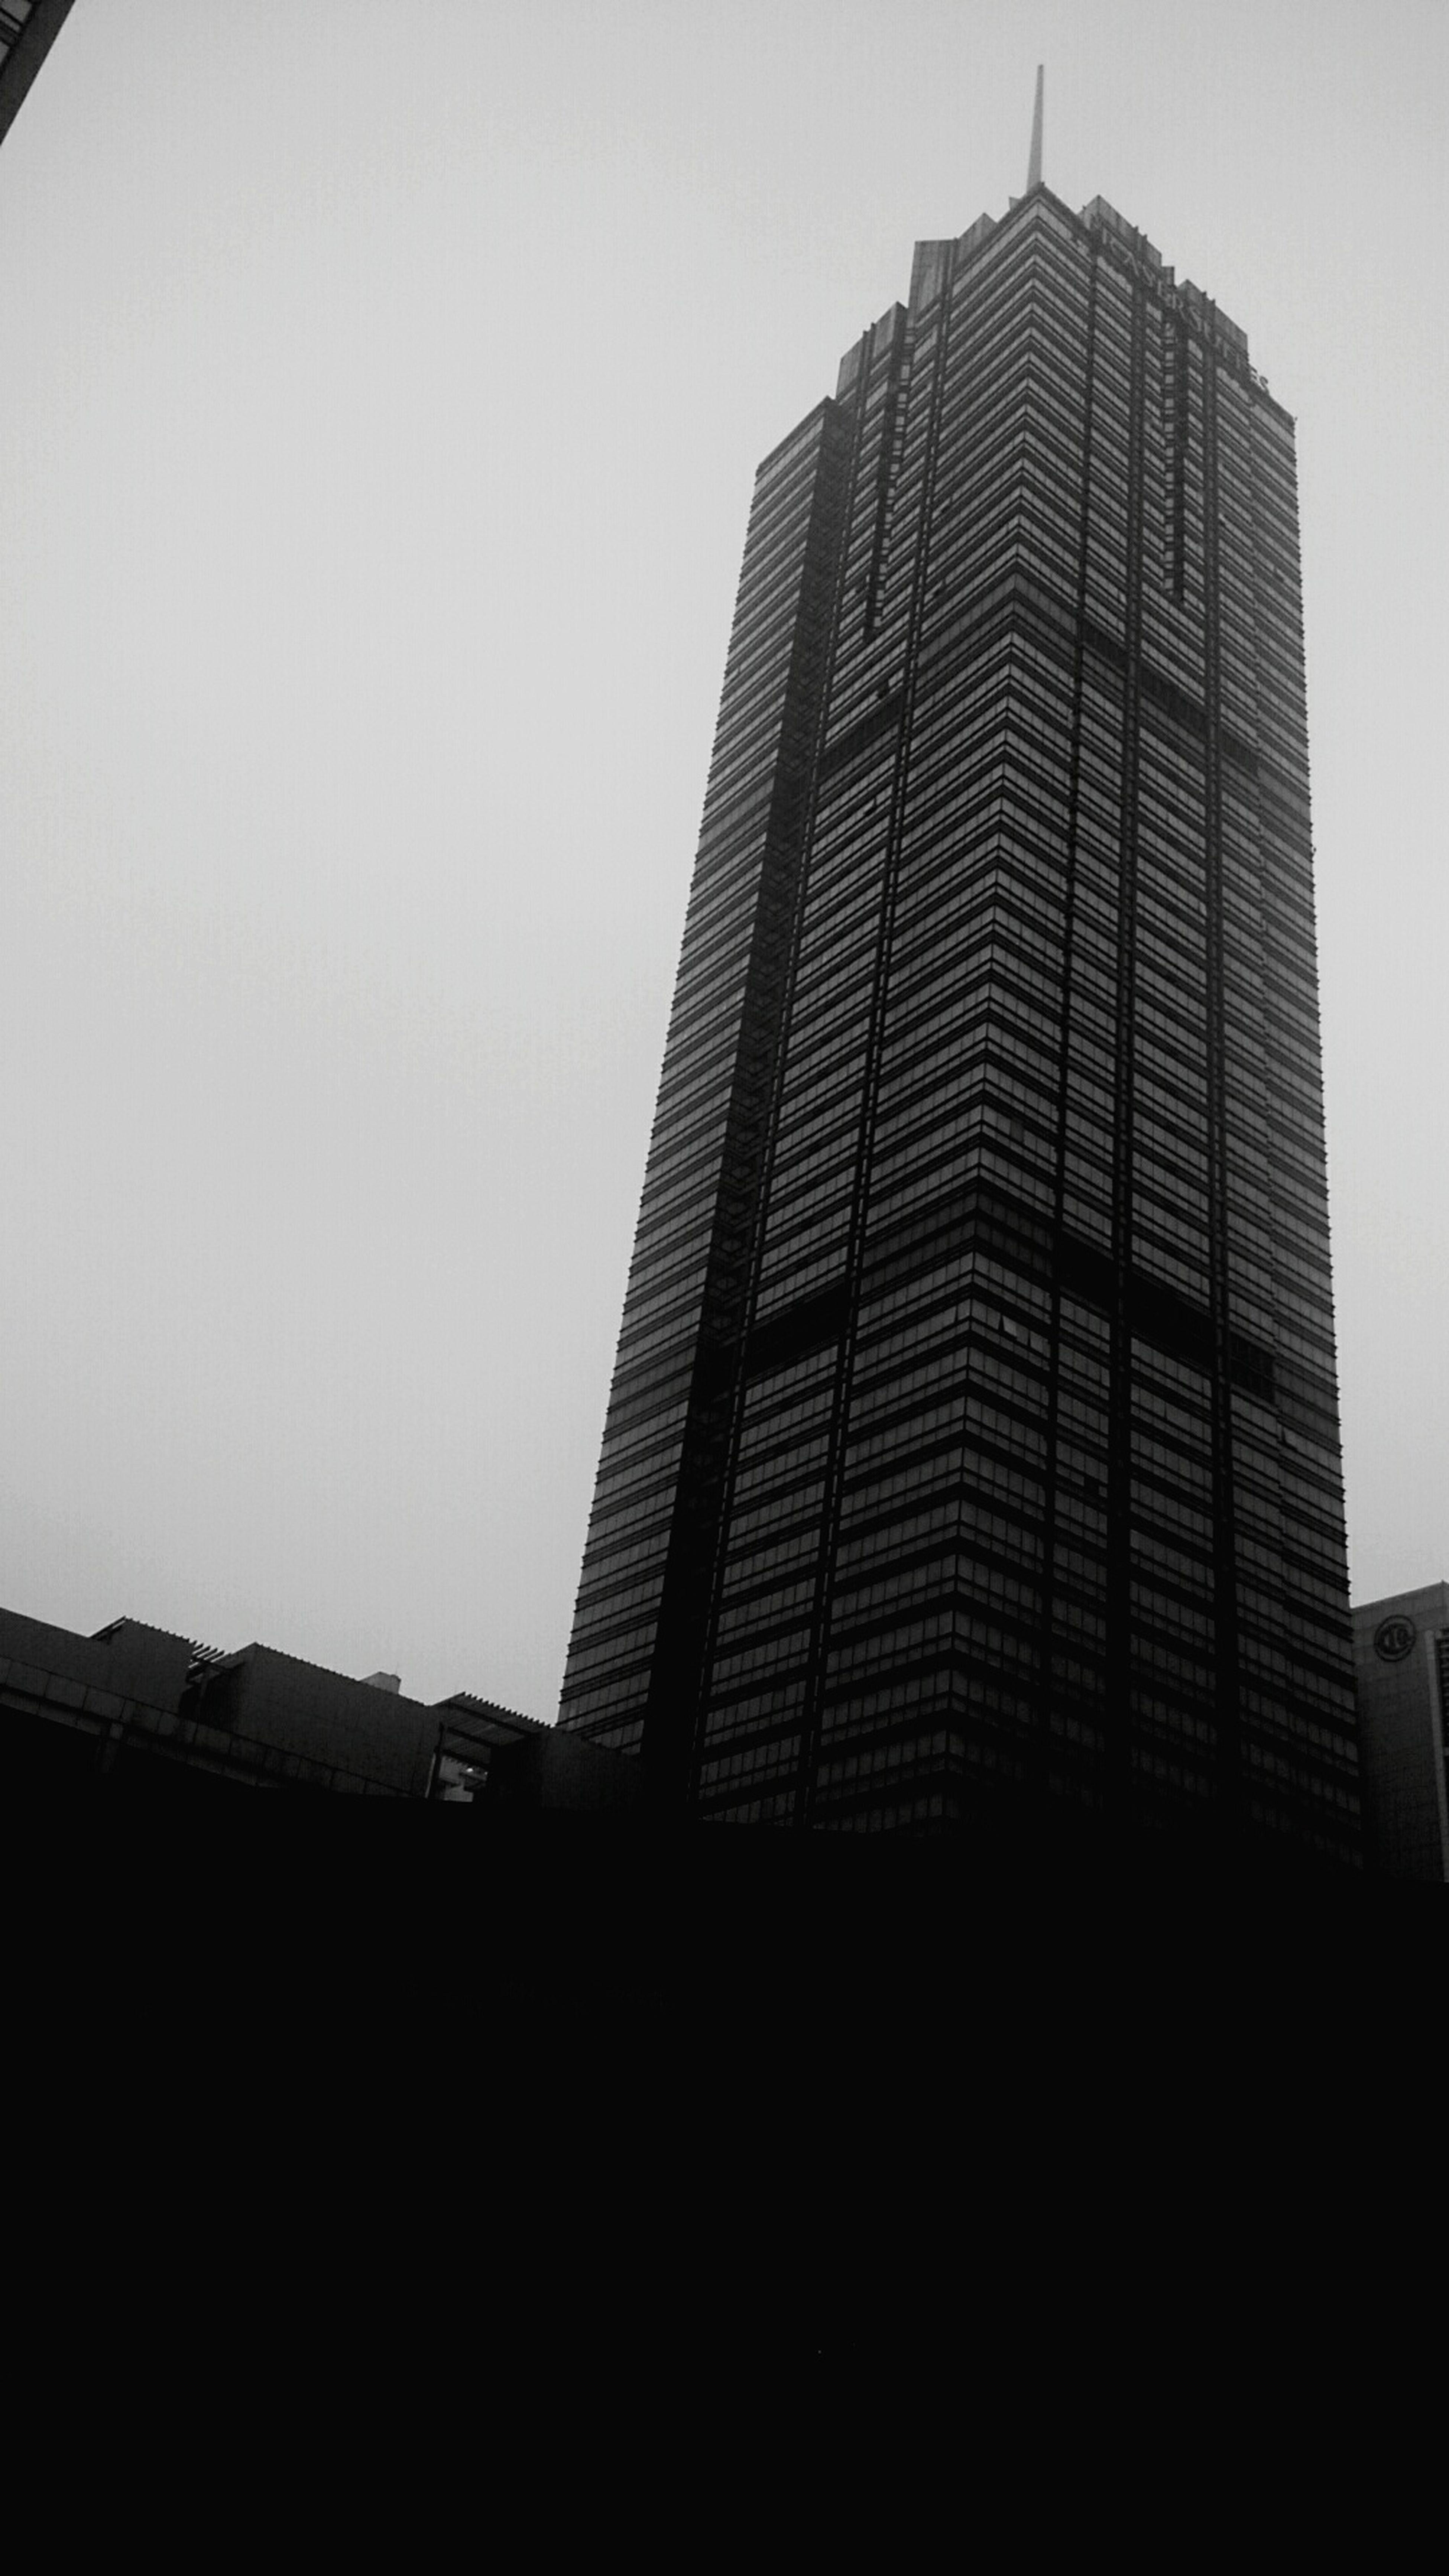 Skyscraper Blackandwhite Likeforlike Follow4follow Frasaiersuites Skyscrapers Suzhou, China